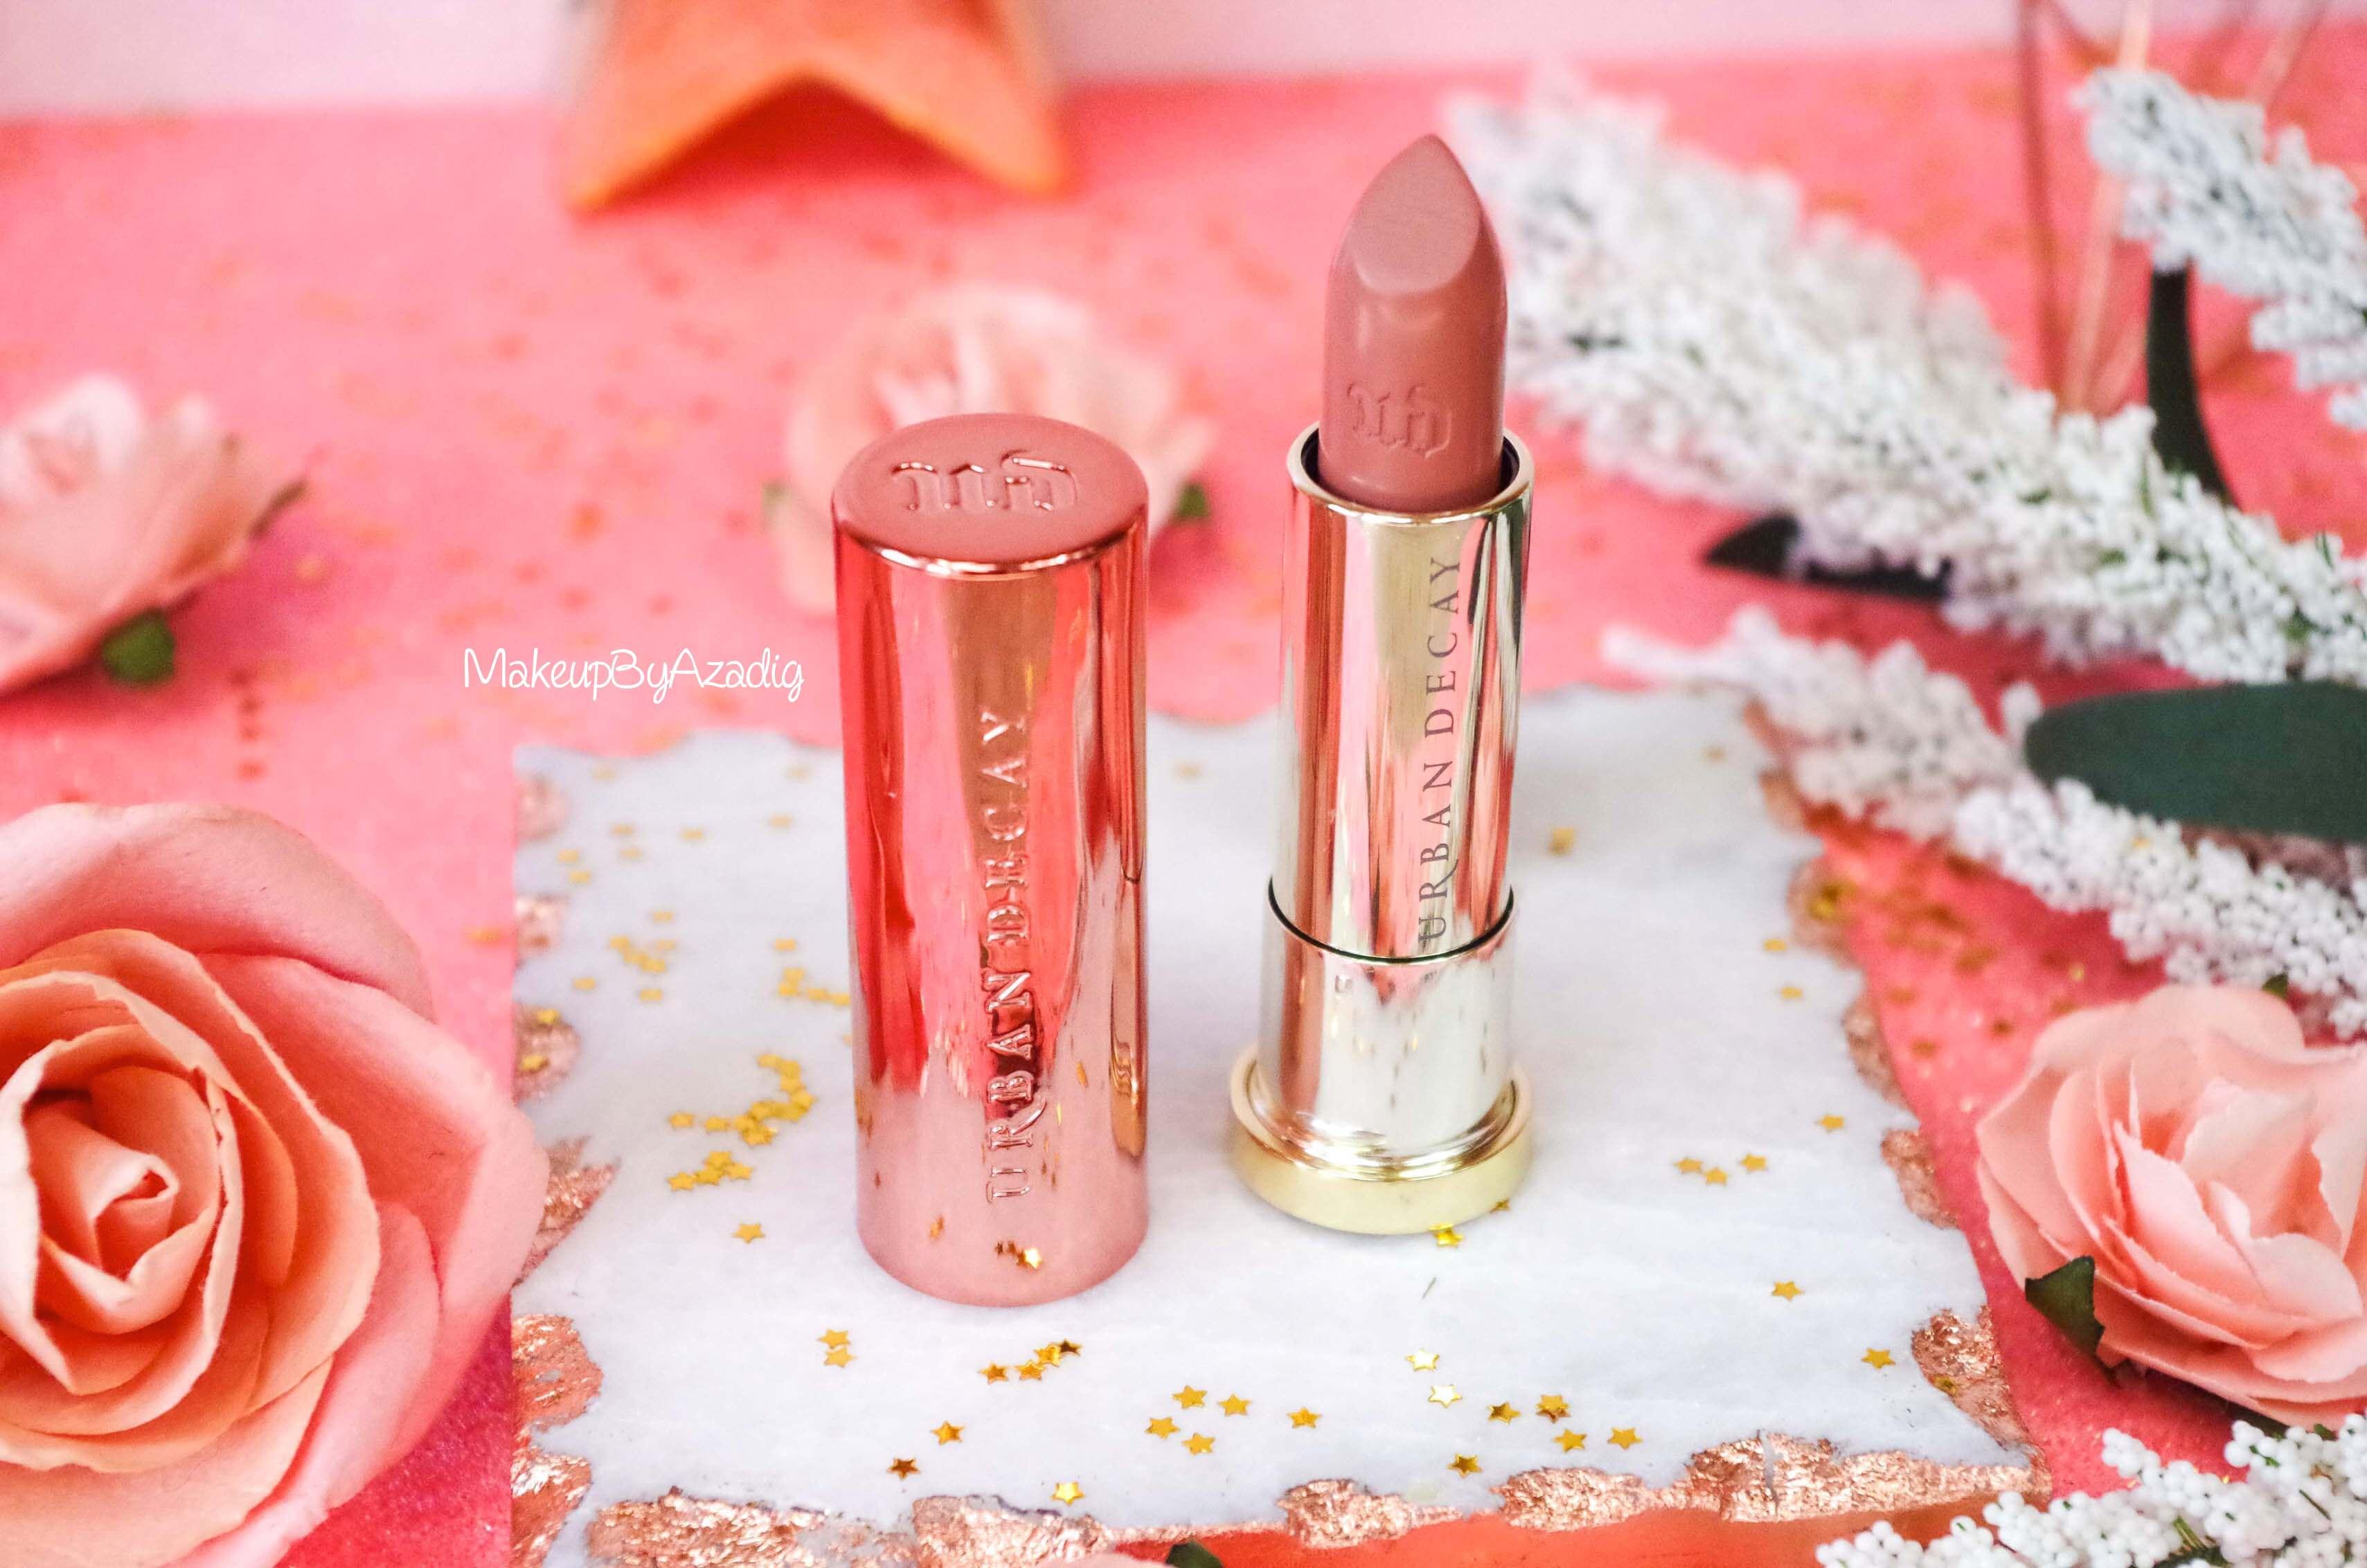 miniature-revue-review-naked-heat-vice-lipstick-fuel-heat-scorched-sephora-urban-decay-makeupbyazadig-prix-avis-troyes